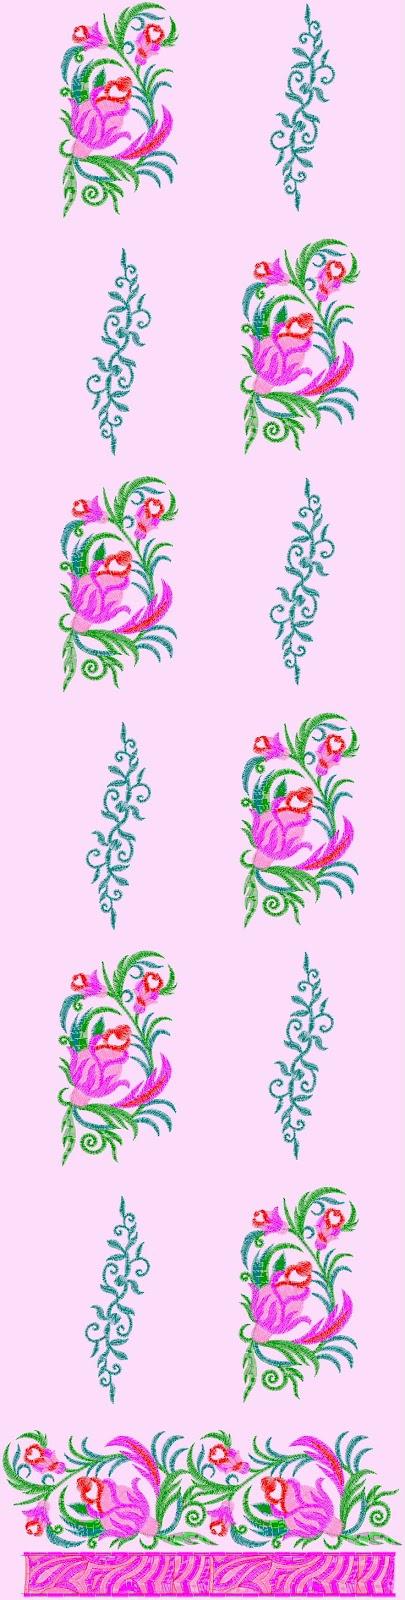 Embdesigntube Salwar Kameez Embroidery Designs With